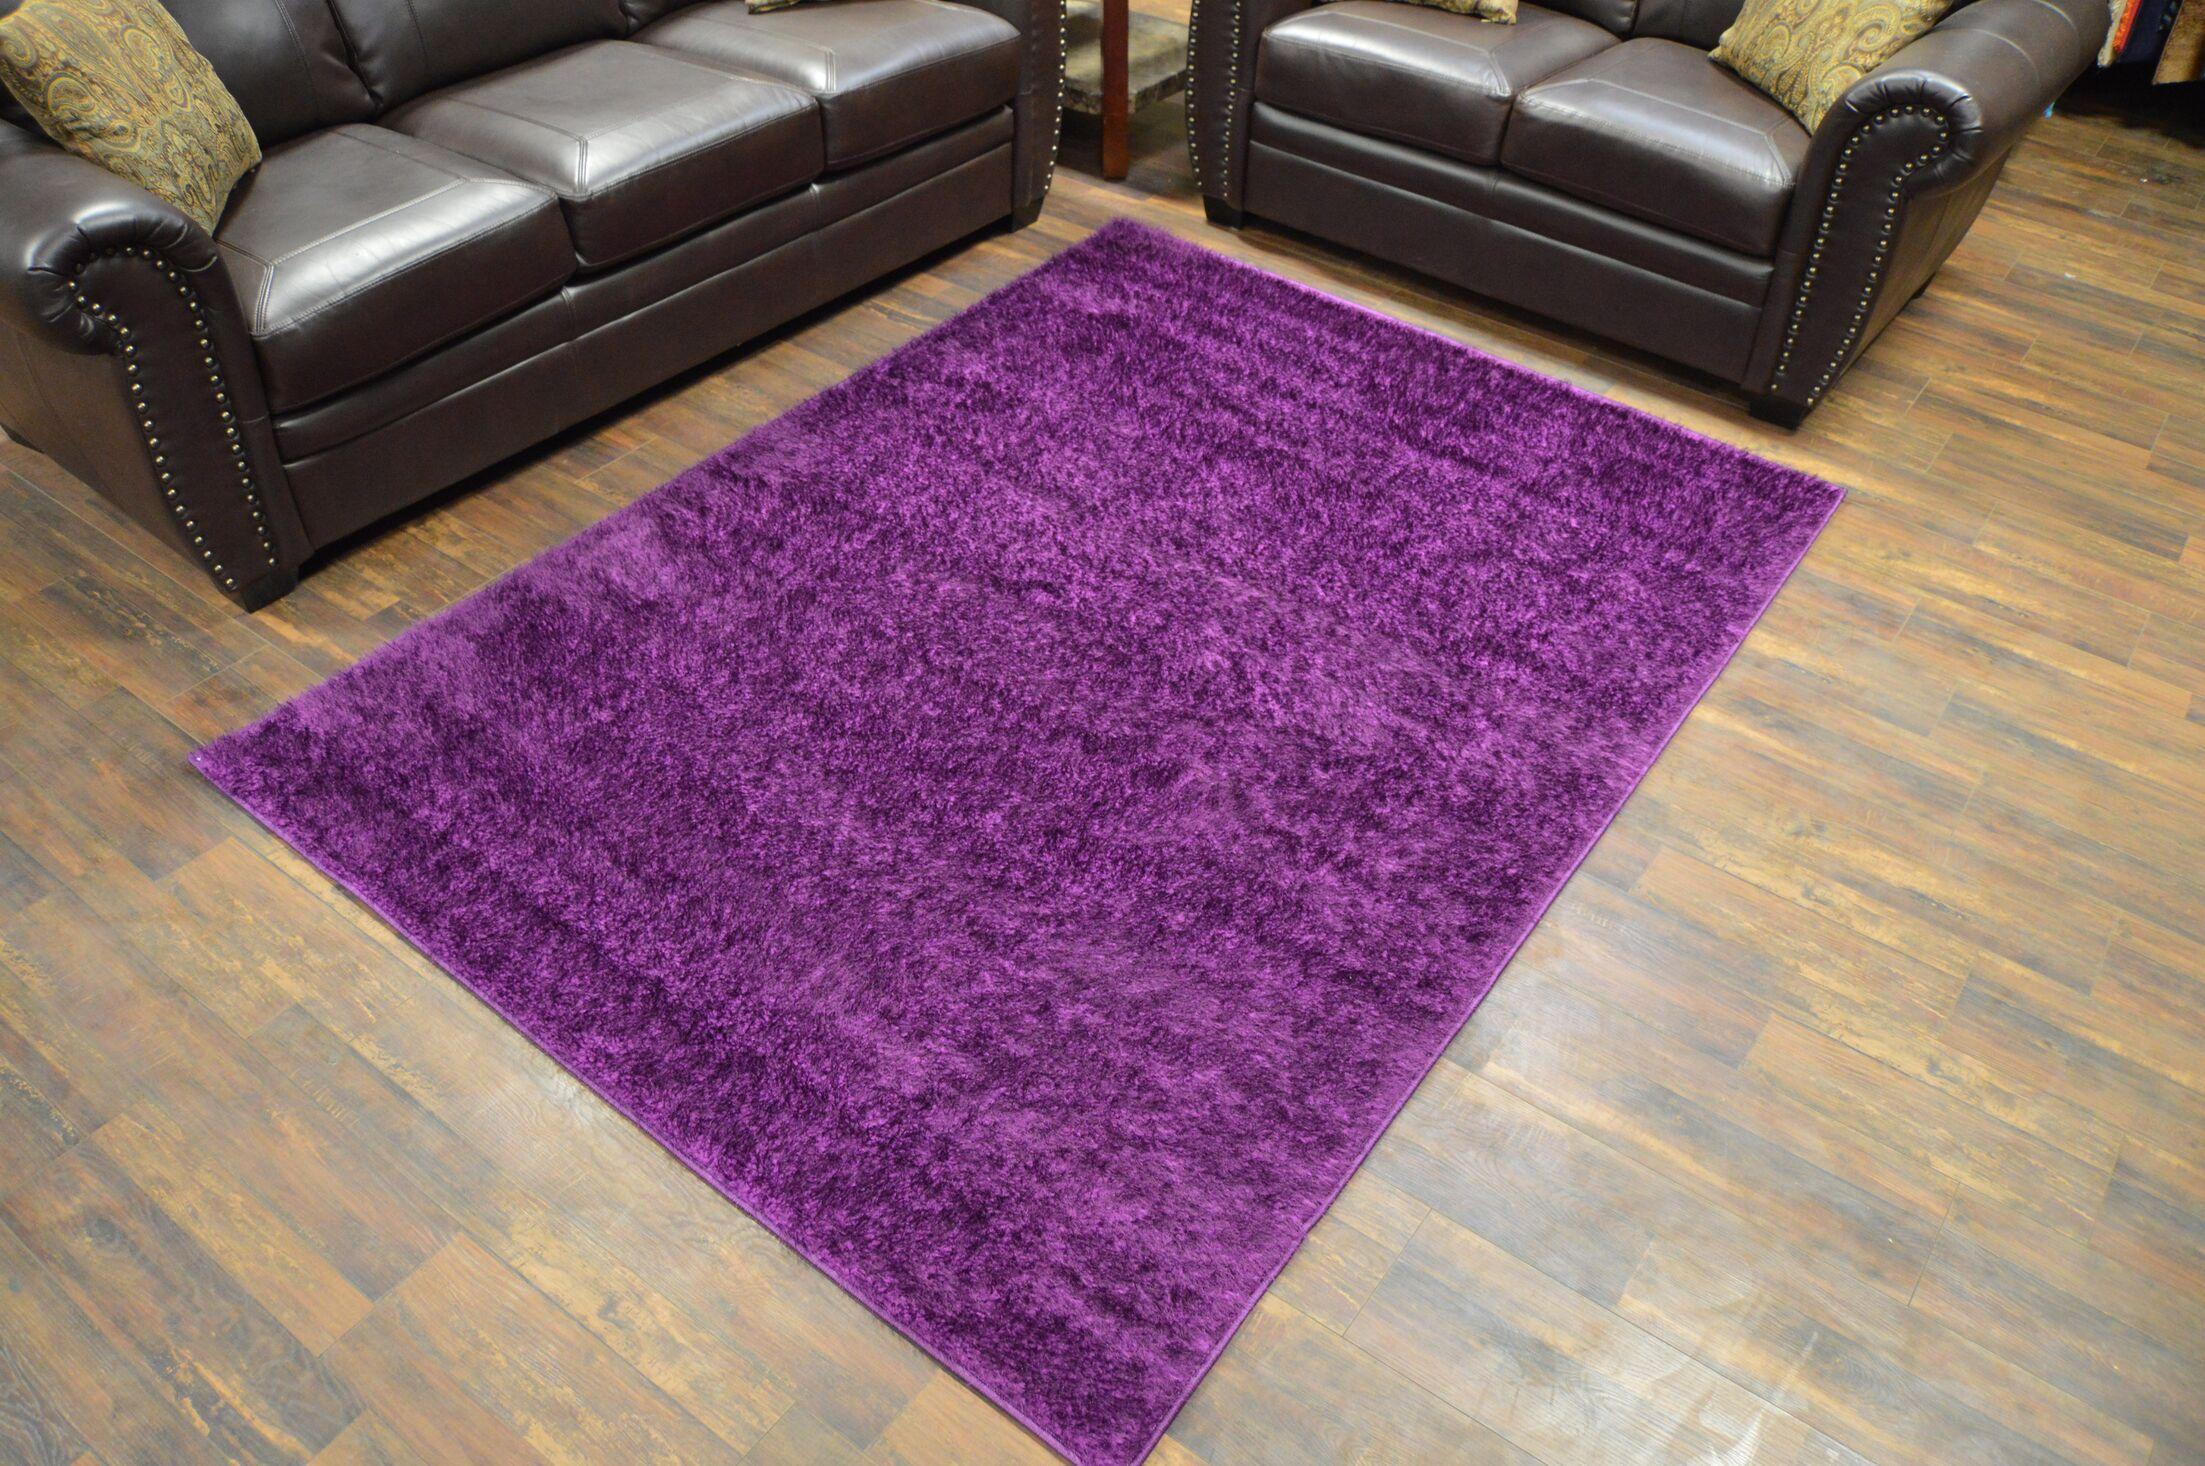 Rauch Shaggy Purple Area Rug